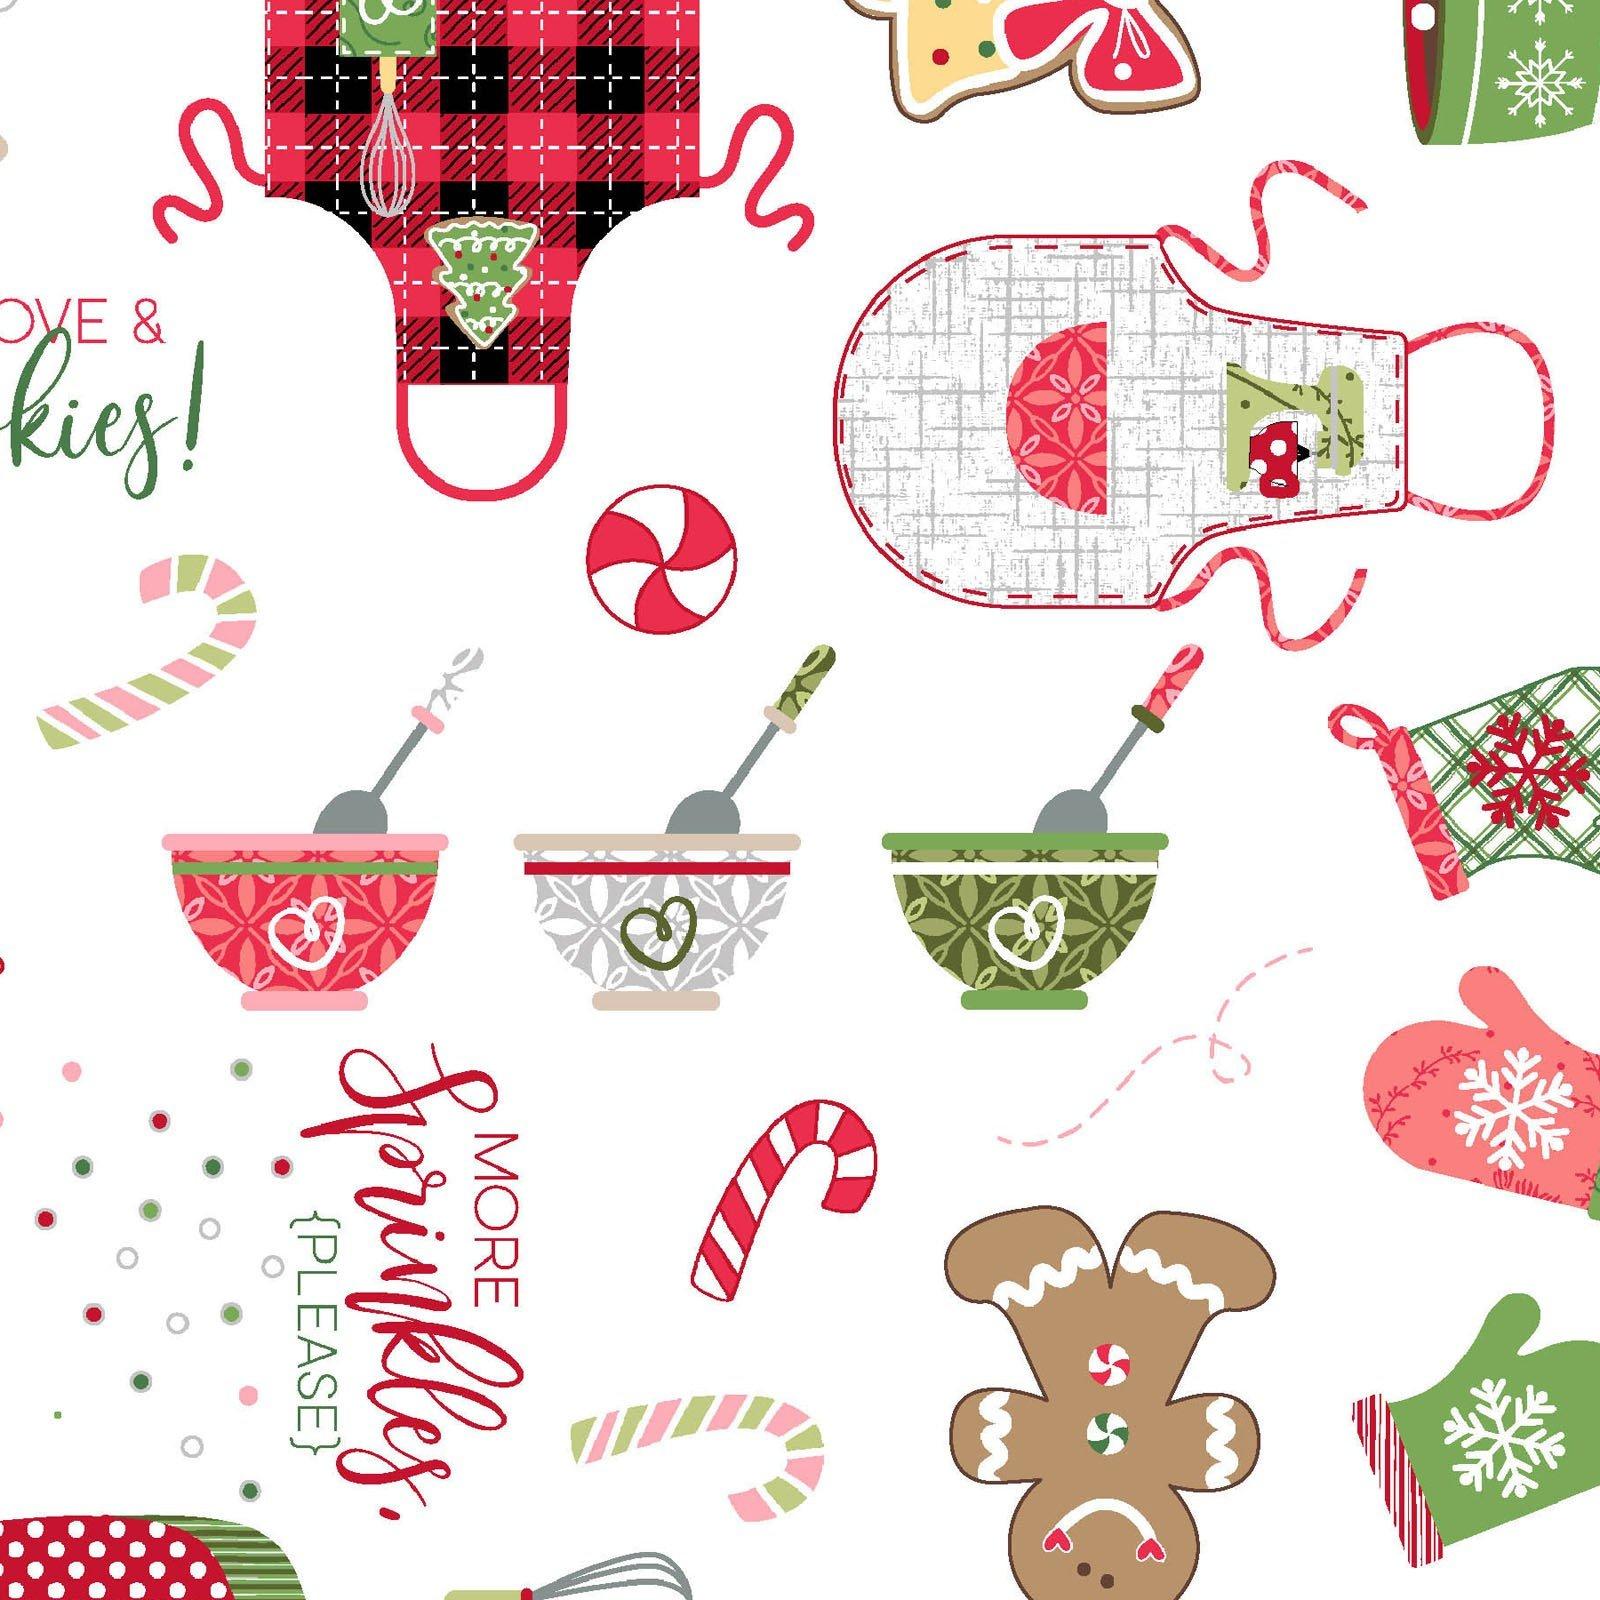 Maywood Studios - We Whisk You A Merry Christmas - Christmas Baking  - White